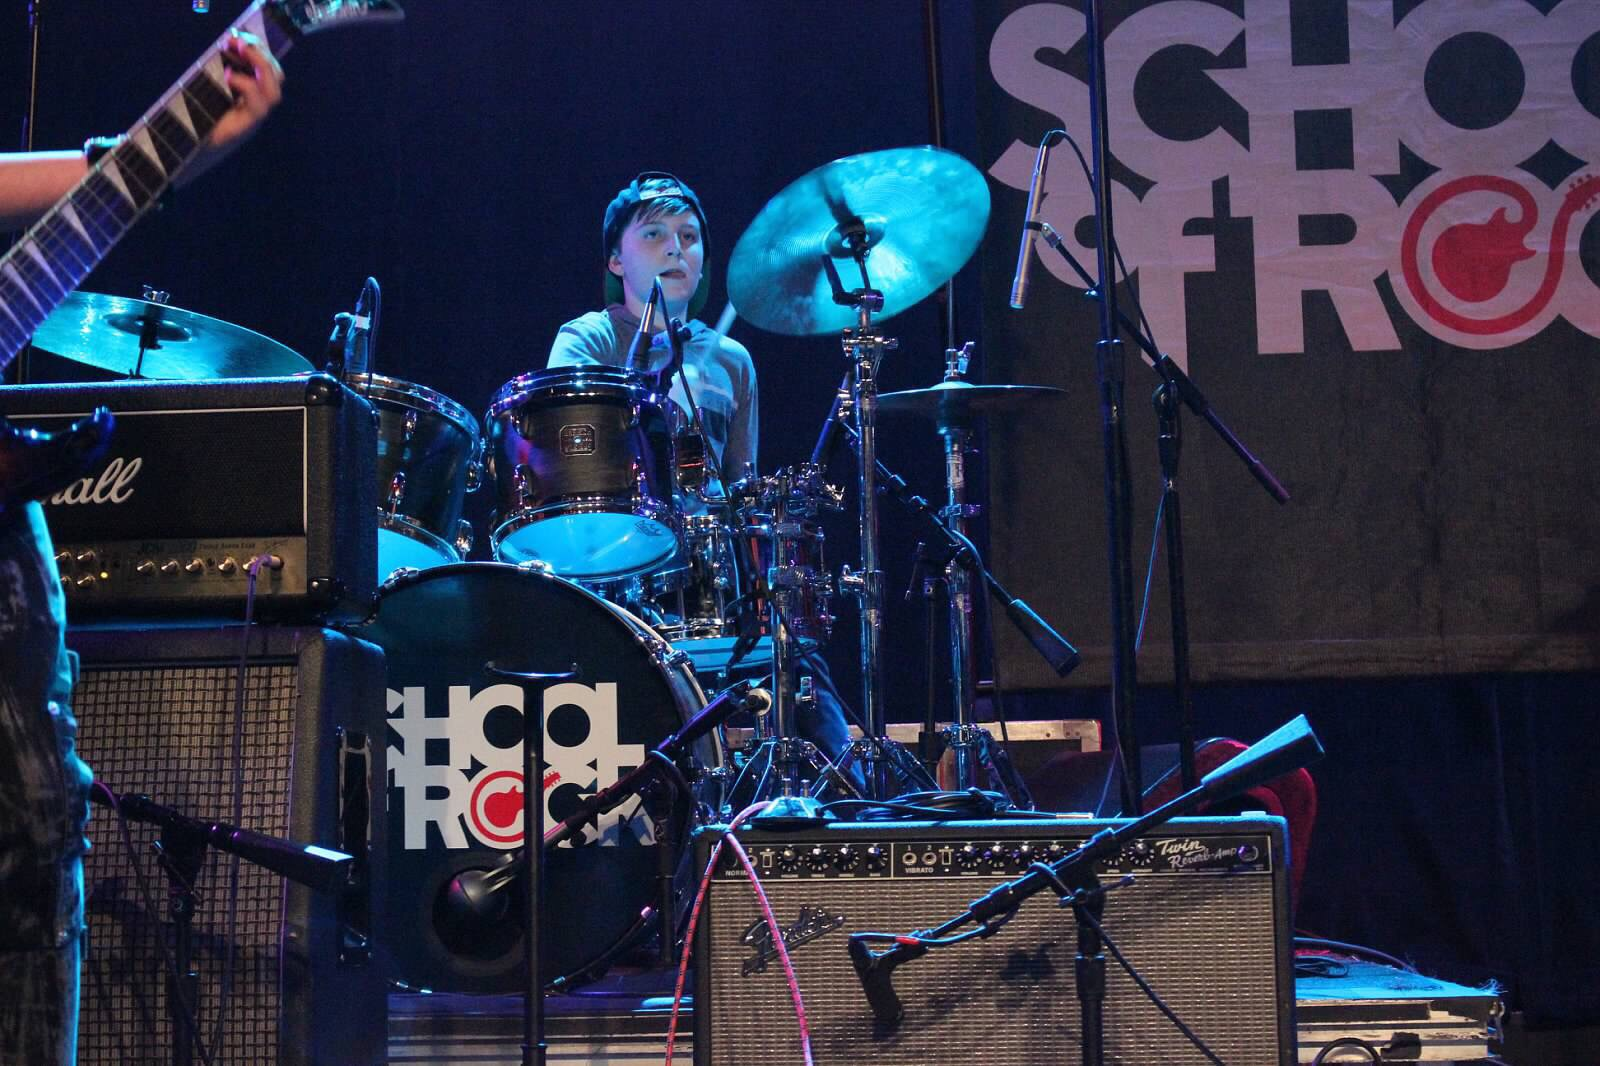 Jersey-Sullivan_hard-rock-cafe-benefit-drums.jpg